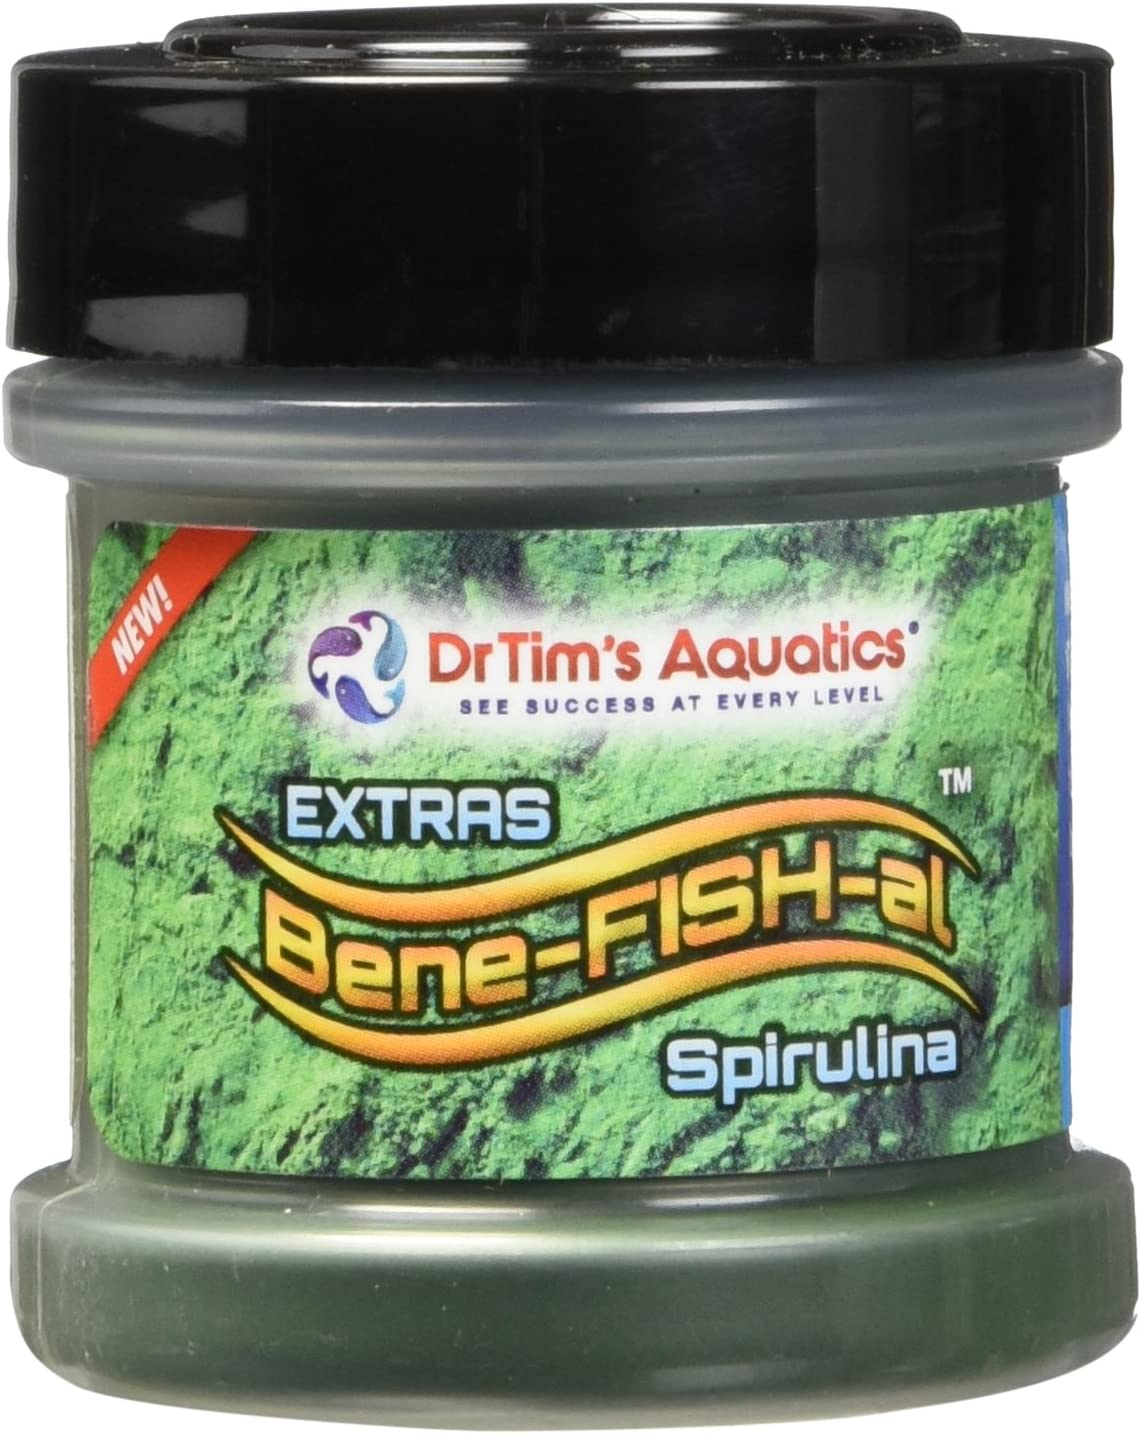 DrTim's Aquatics Fish Food Enhancement